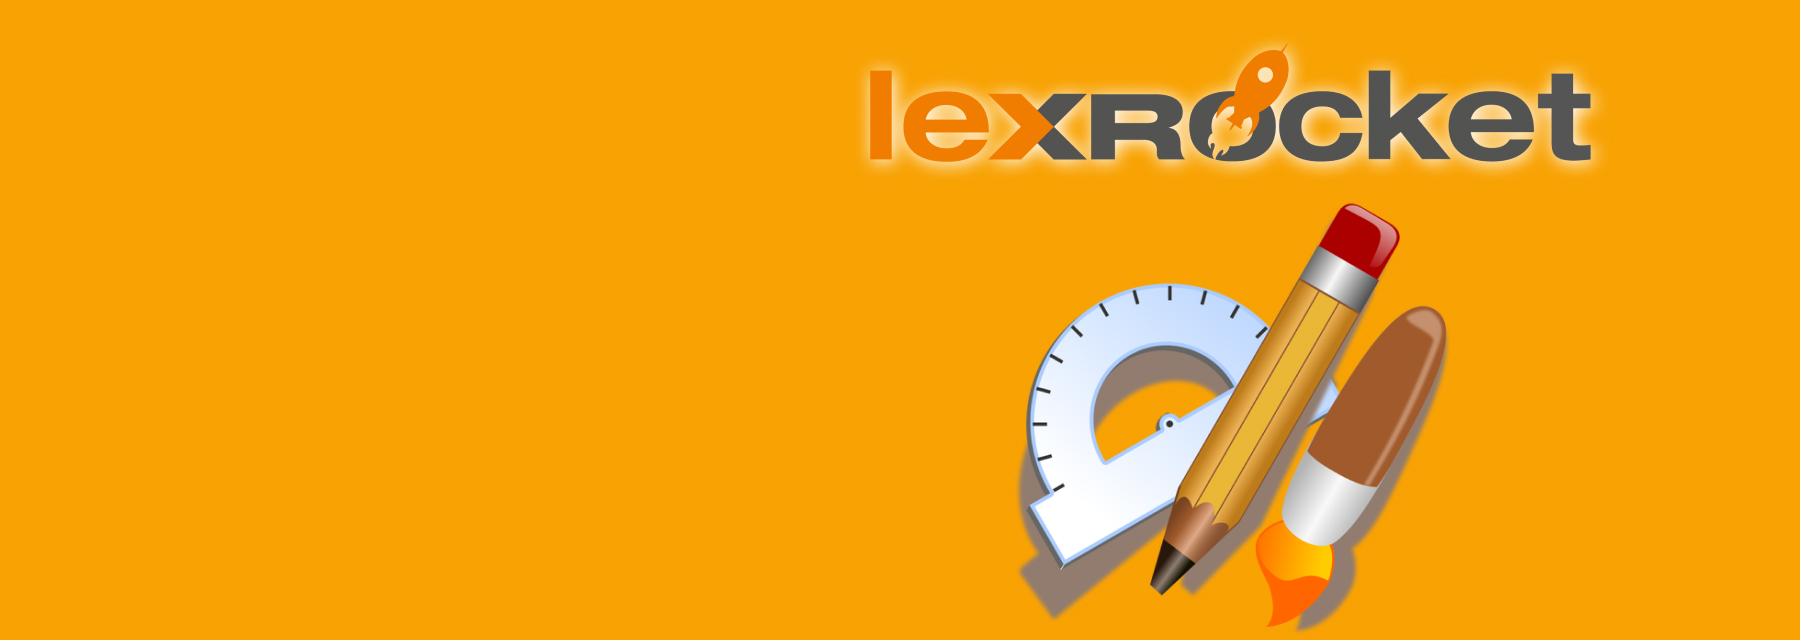 Startup Tools LEXROCKET Machen! Magazin